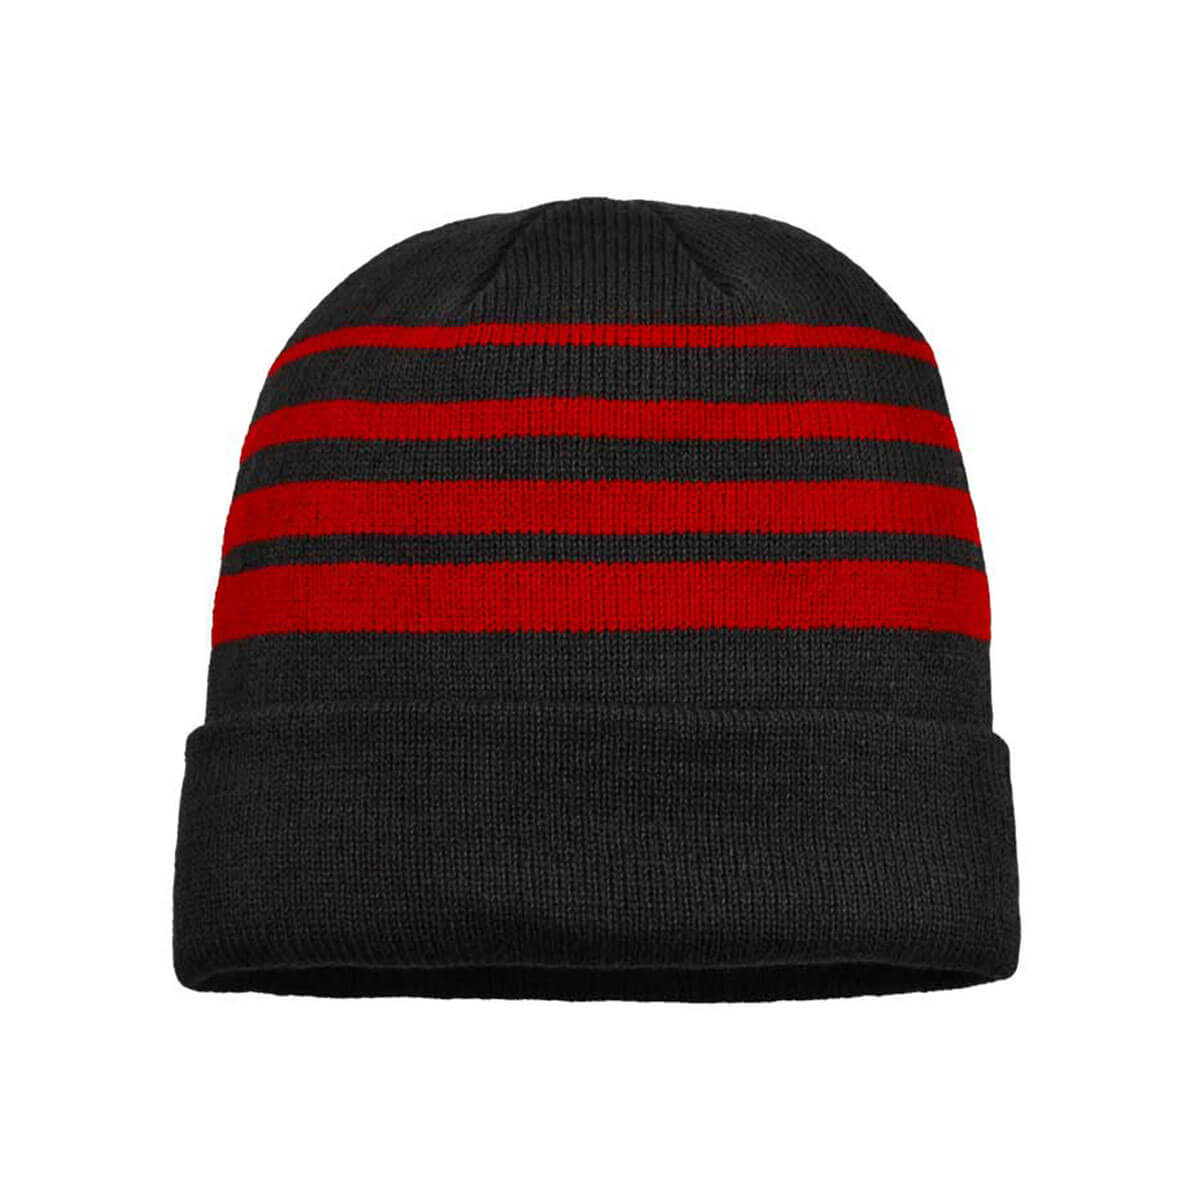 Acrylic Beanie-Black / Red